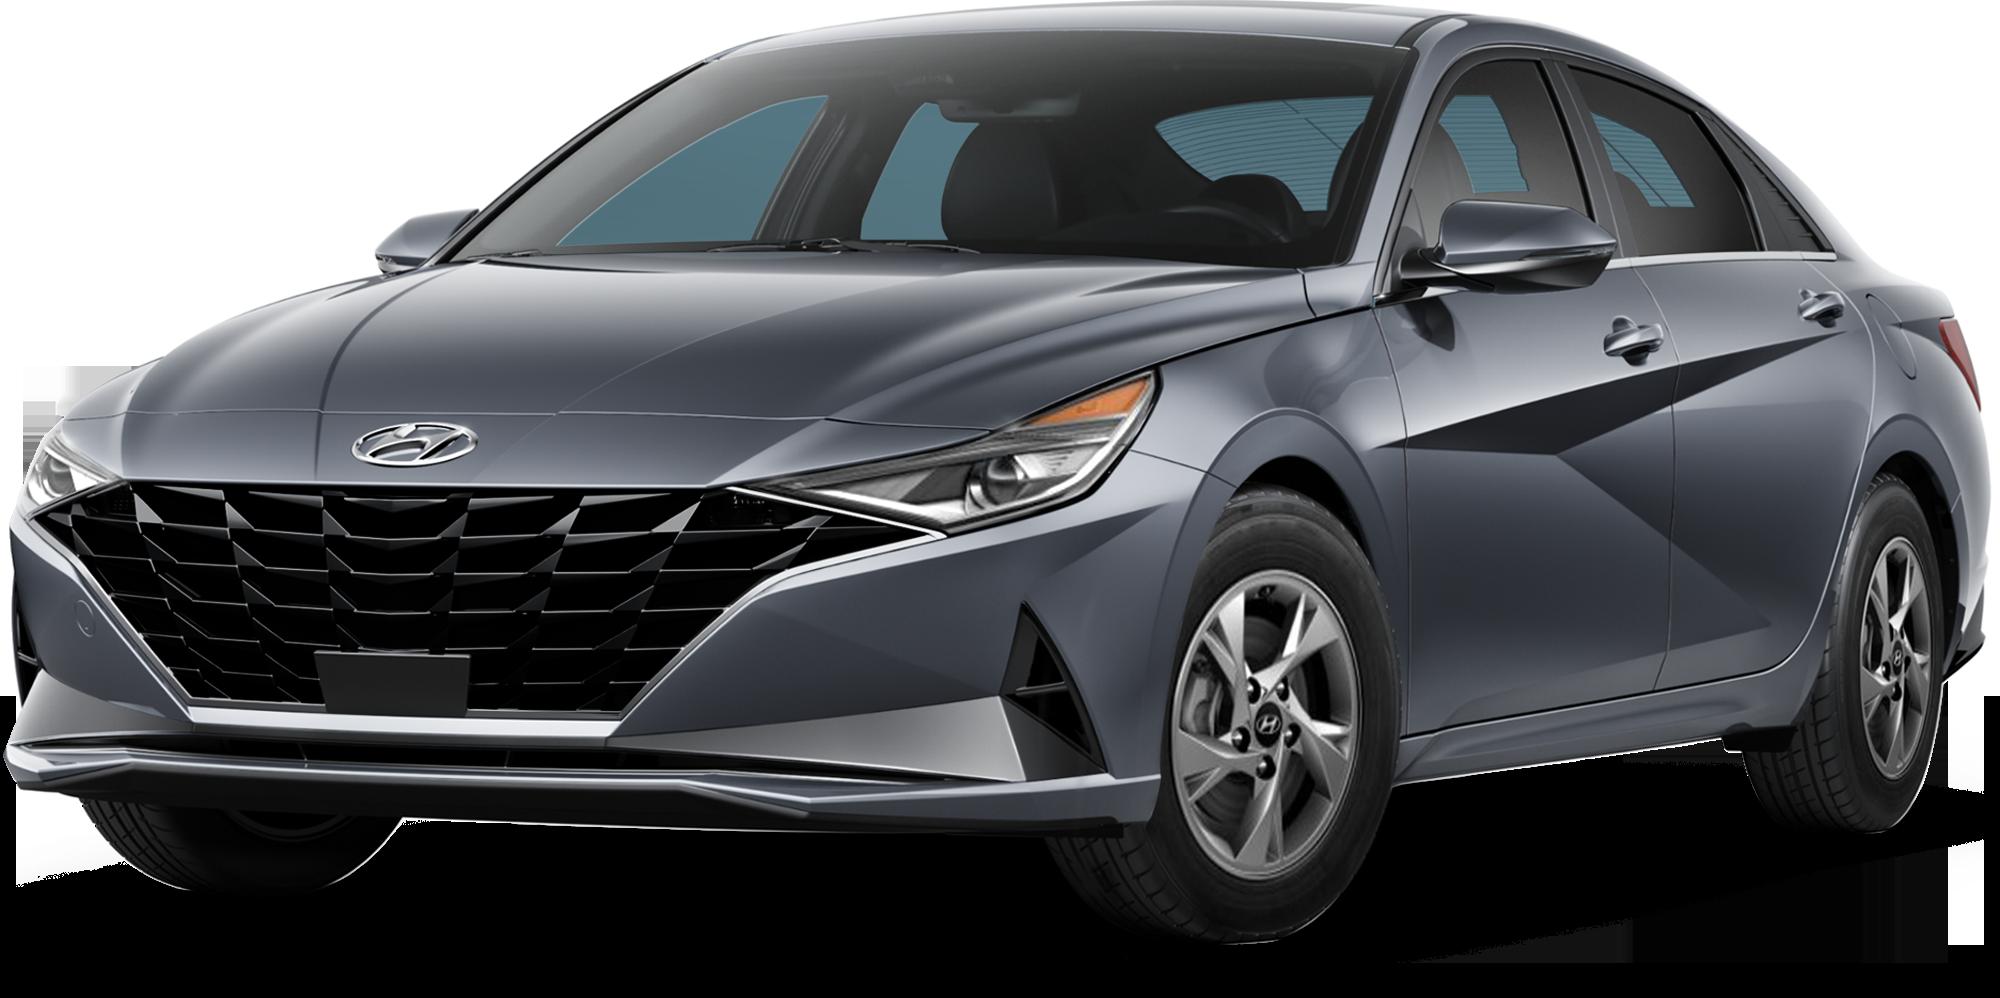 2021 Hyundai Elantra Incentives, Specials & Offers in ...